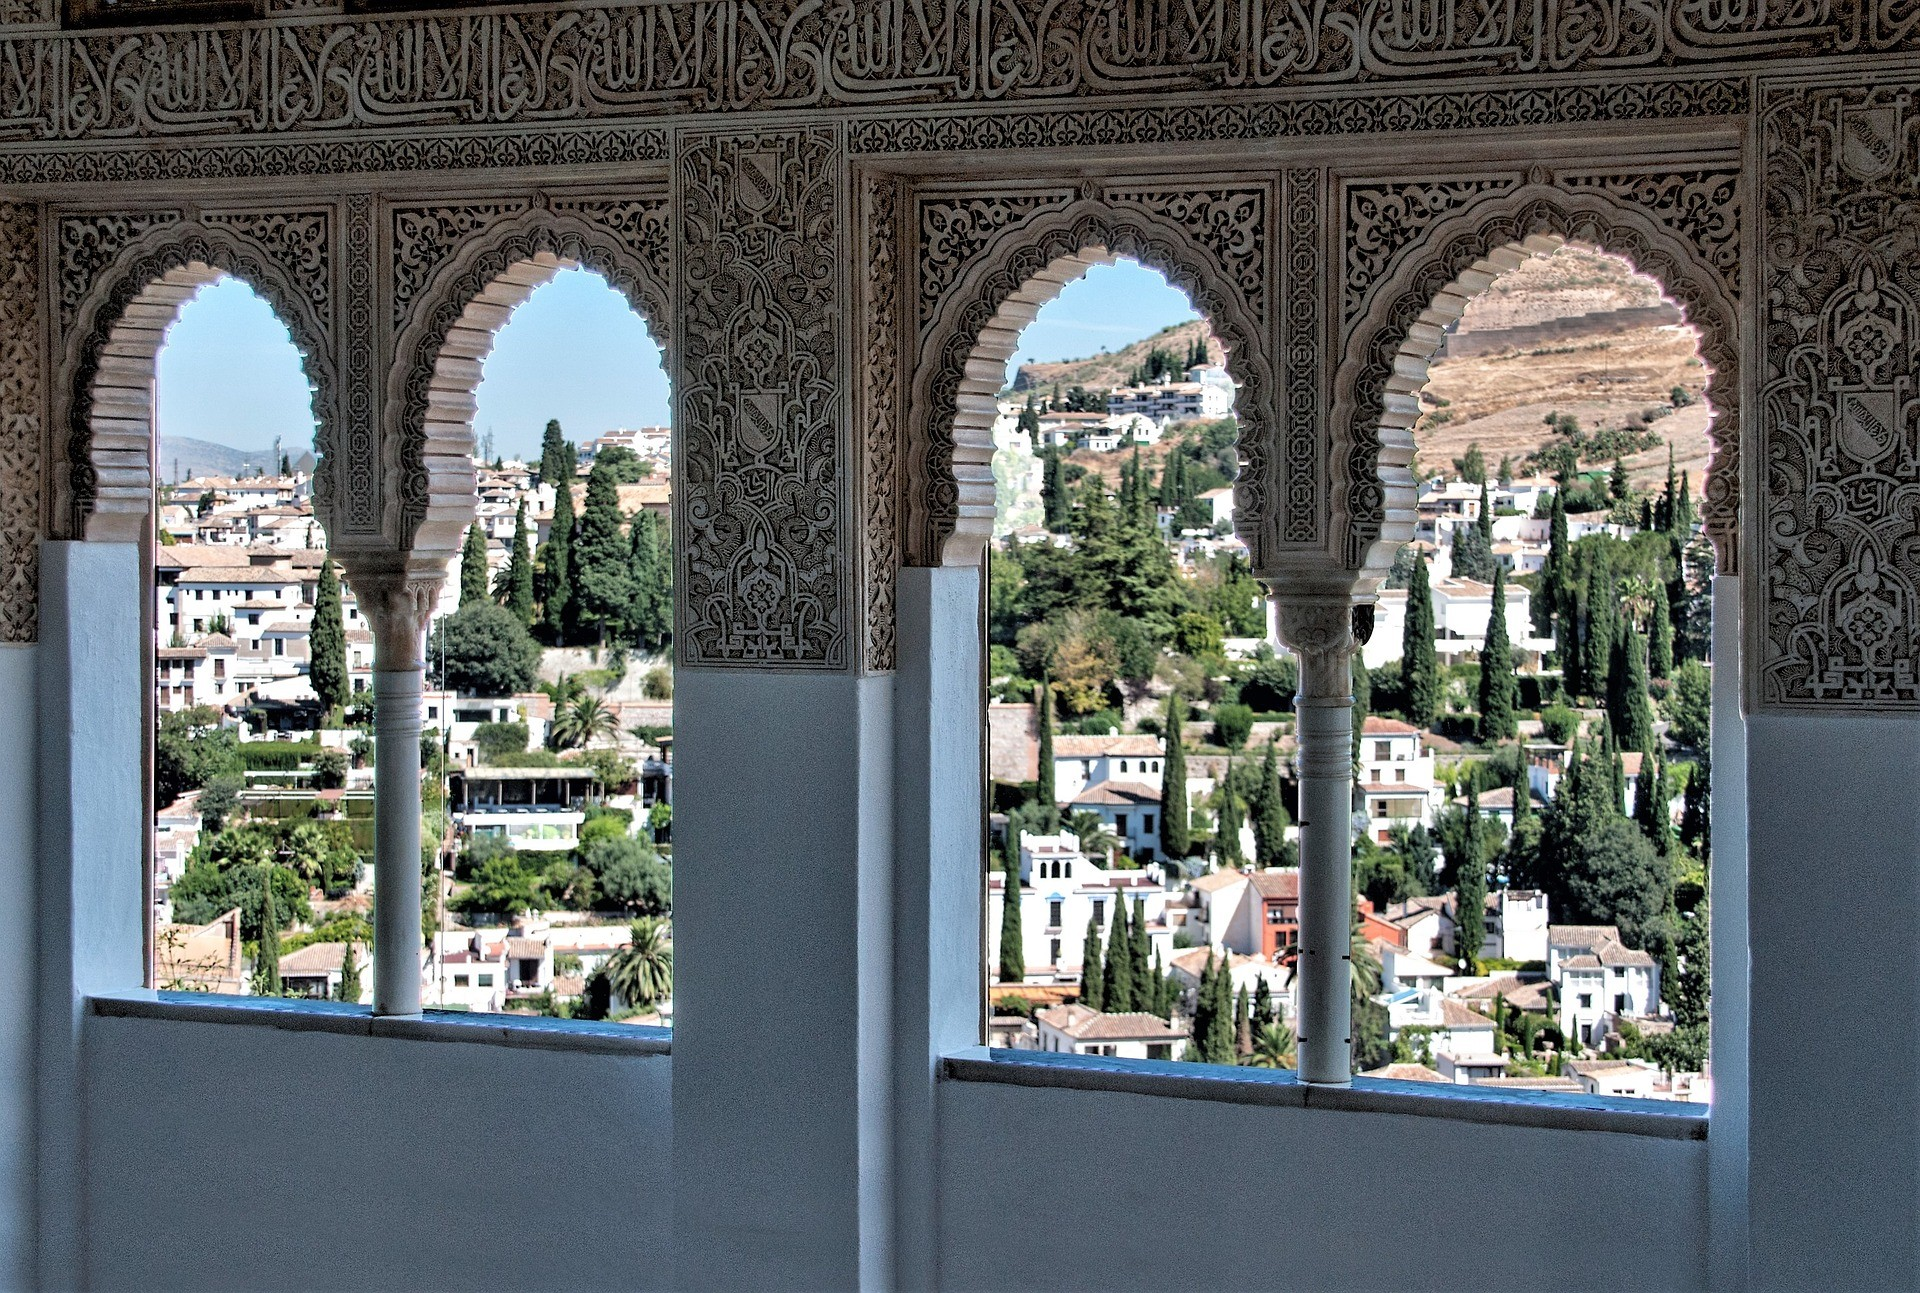 Granada in Andalusia Spagna - Foto di Denis Doukhan da Pixabay